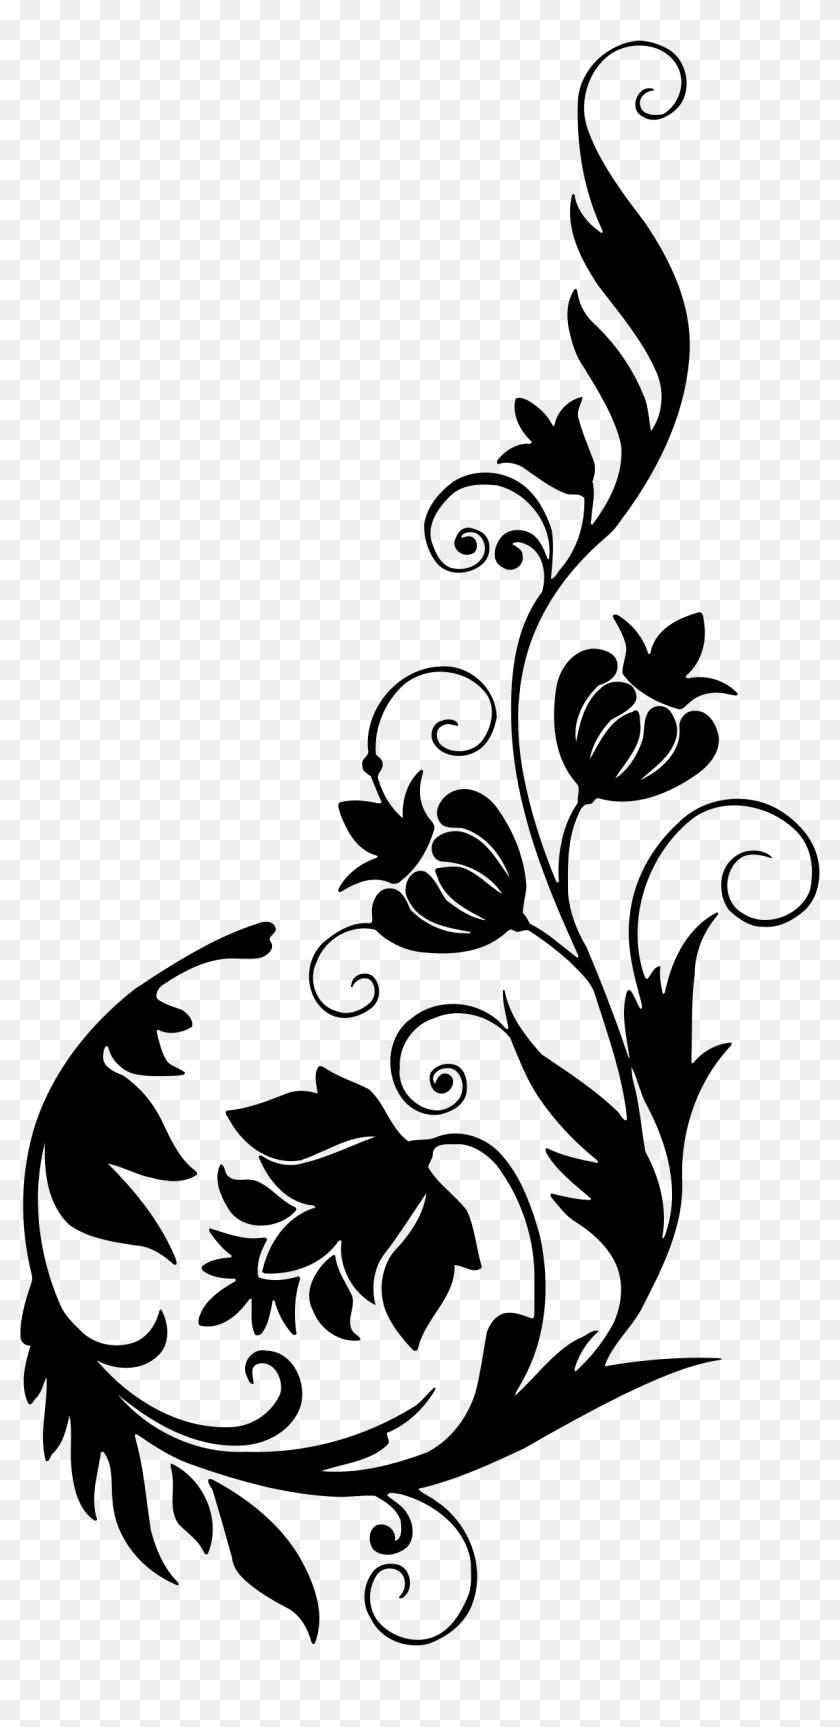 Free Download Vektor Bunga Clipart Firkin Flower Clip